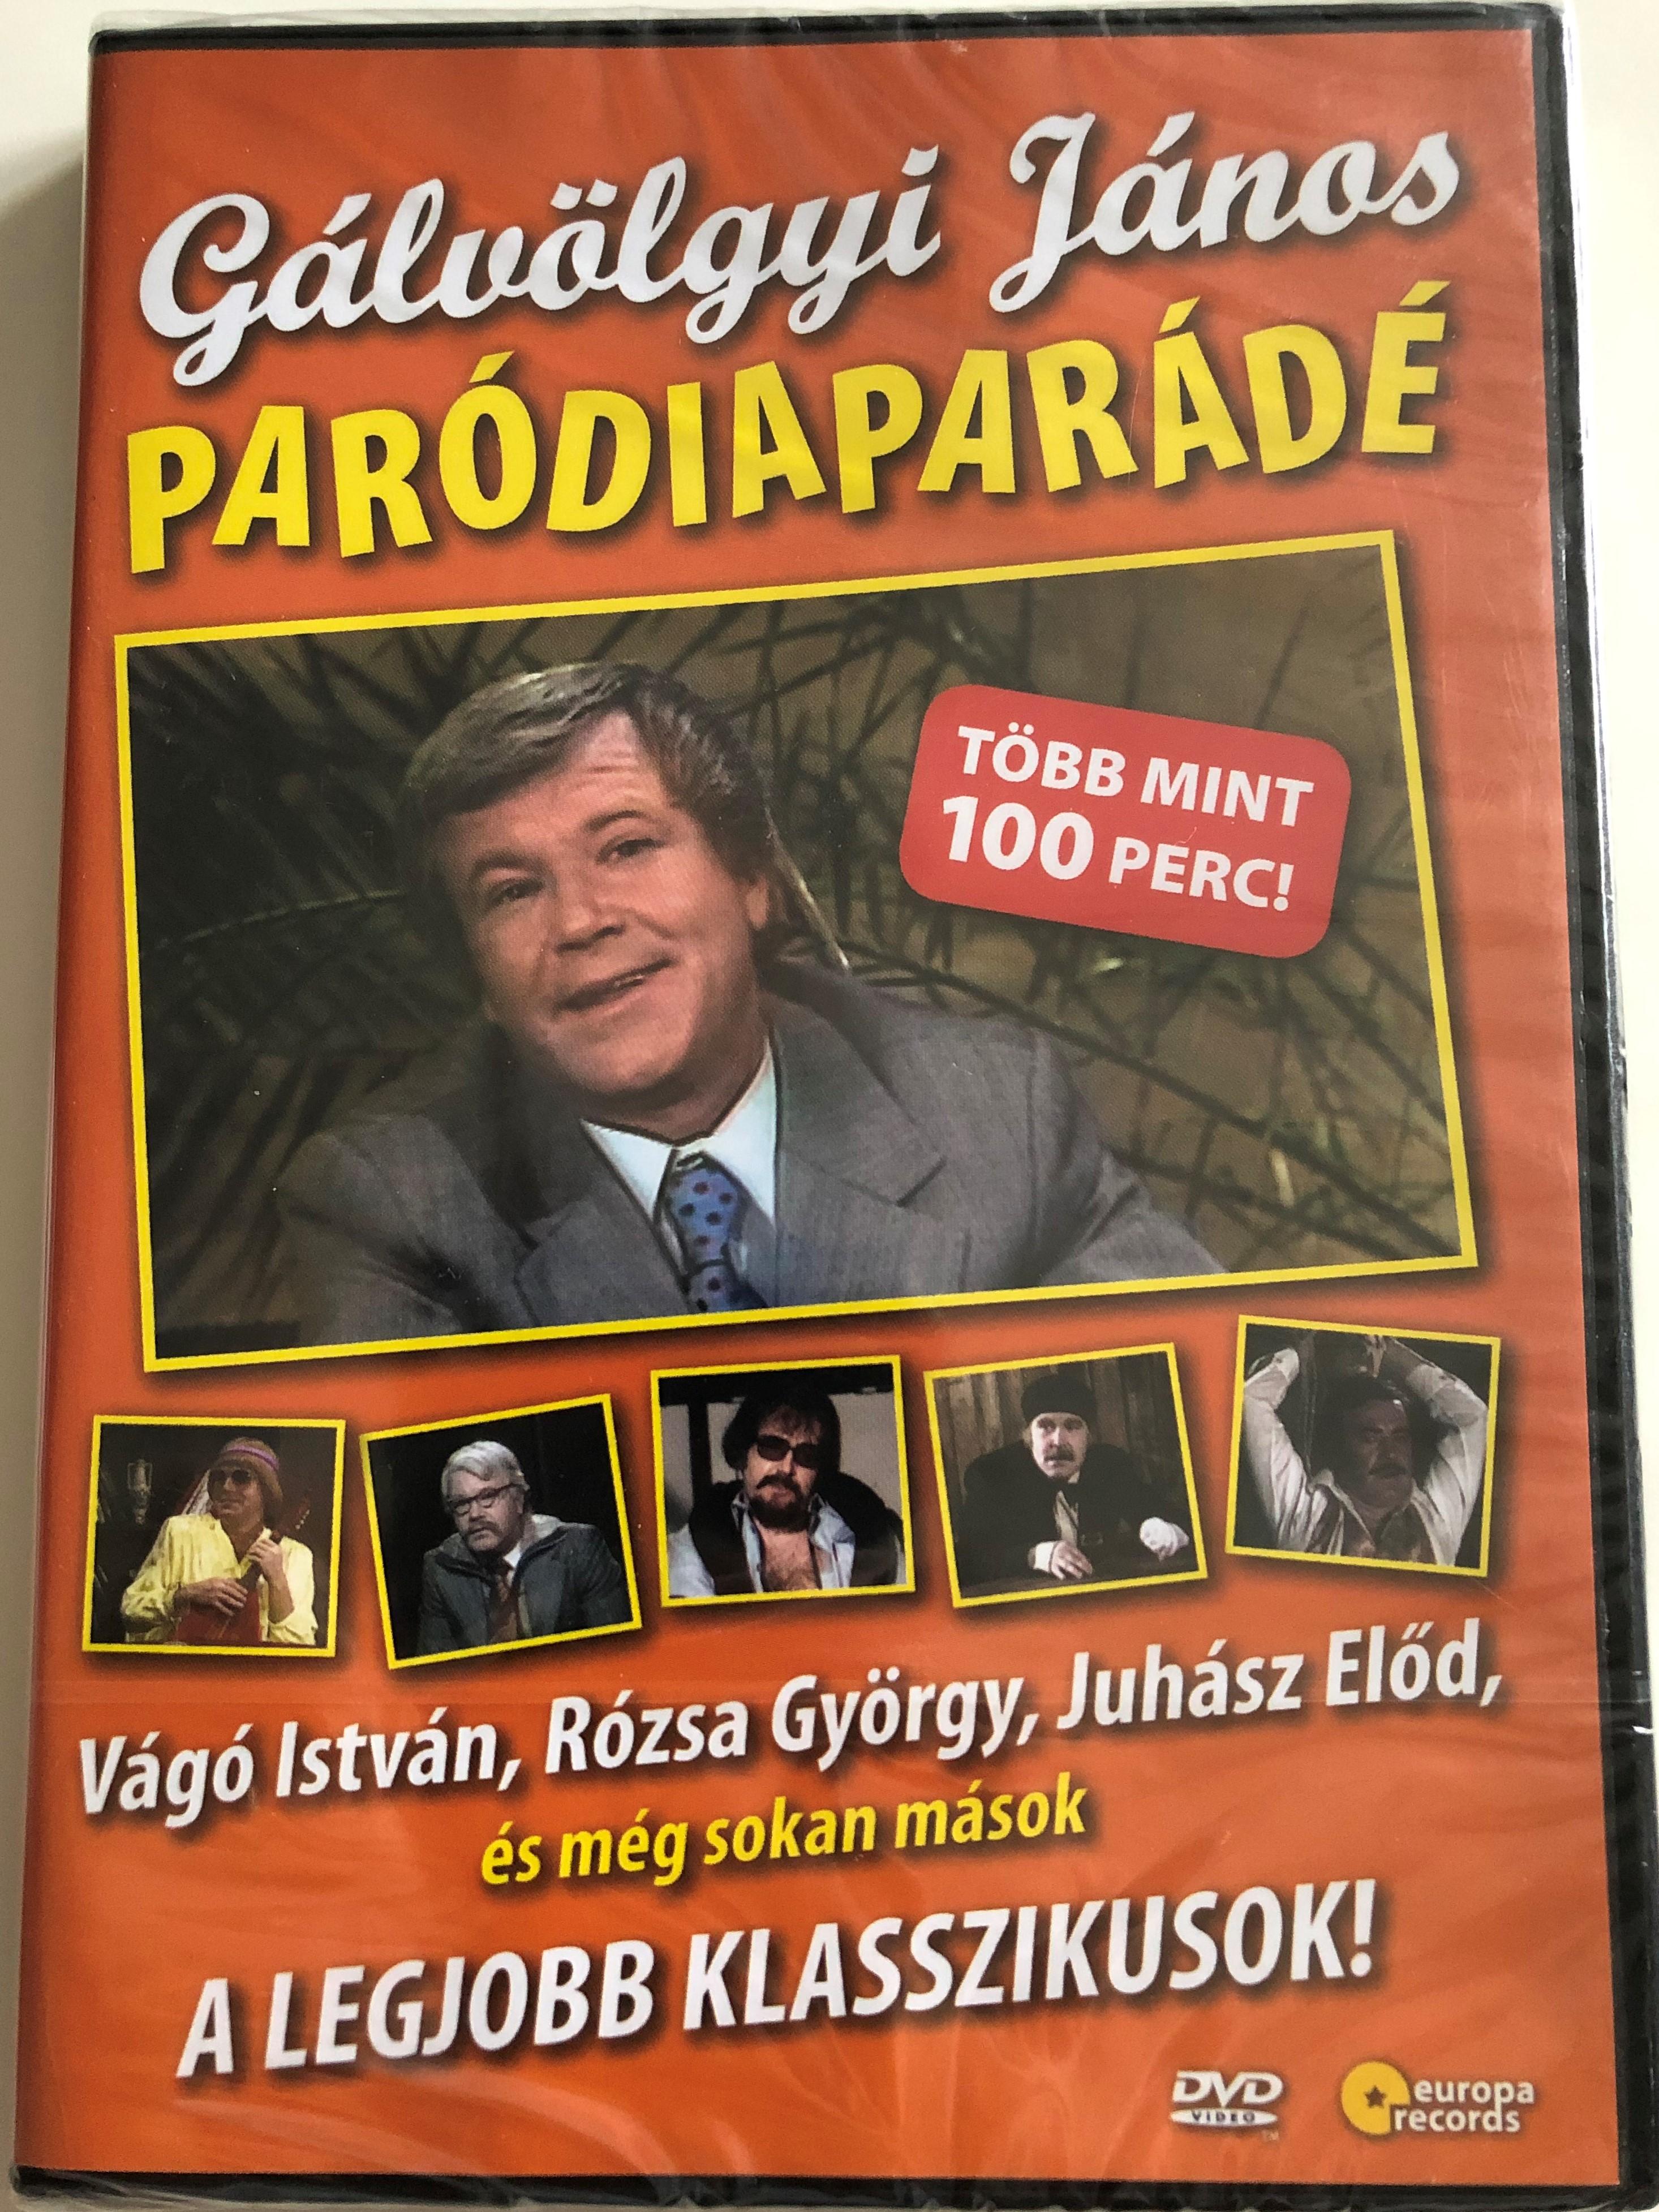 g-lv-lgyi-j-nos-parodiapar-d-dvd-hungarian-parody-show-1.jpg